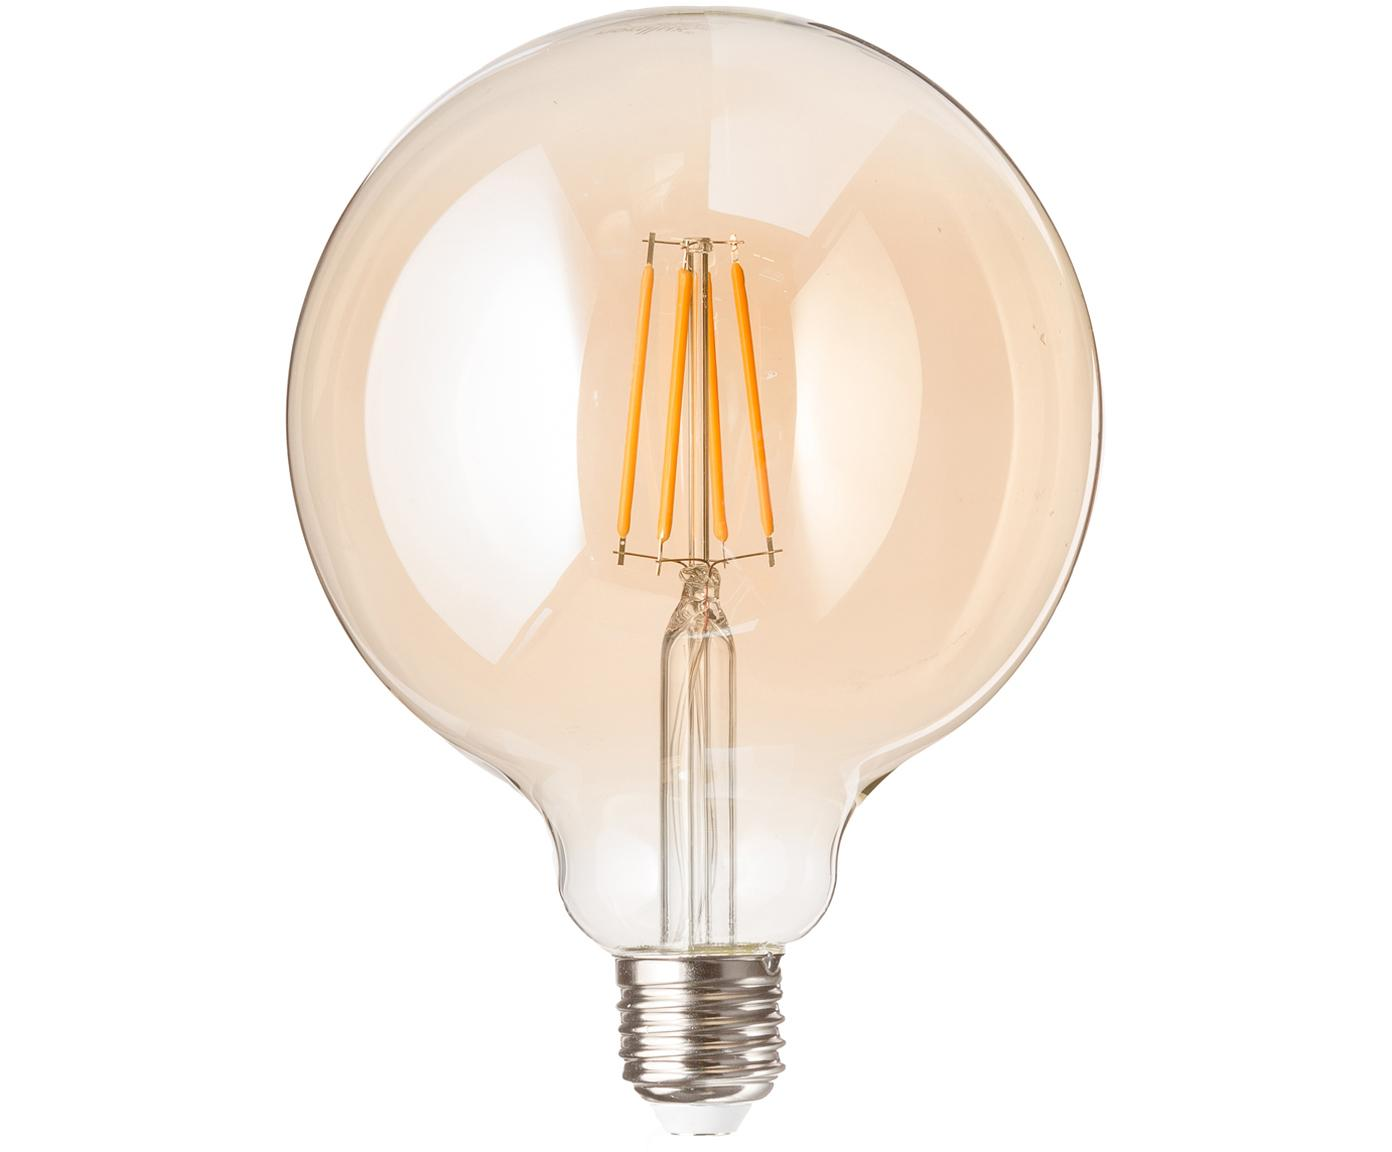 Leuchtmittel Nakir (E27/1.9W), 2 Stück, Leuchtmittelschirm: Glas, Leuchtmittelfassung: Aluminium, Bernsteinfarben, Ø 12 x H 18 cm